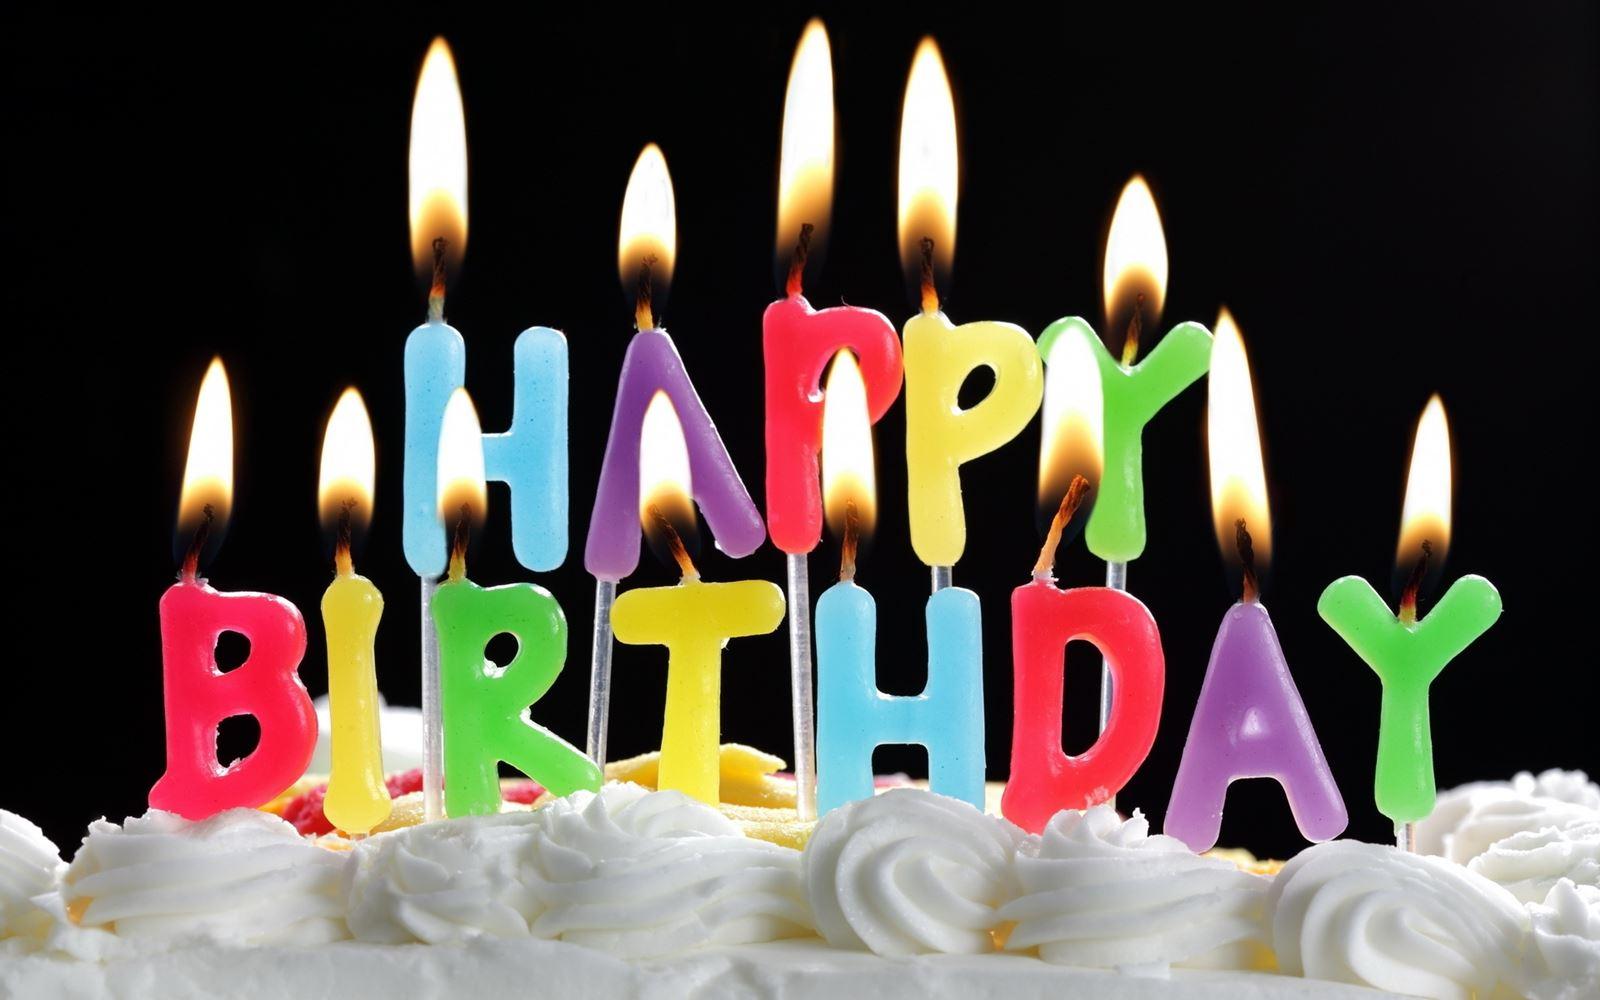 Sparkling Happy Birthday To SpArkliNg AnGel